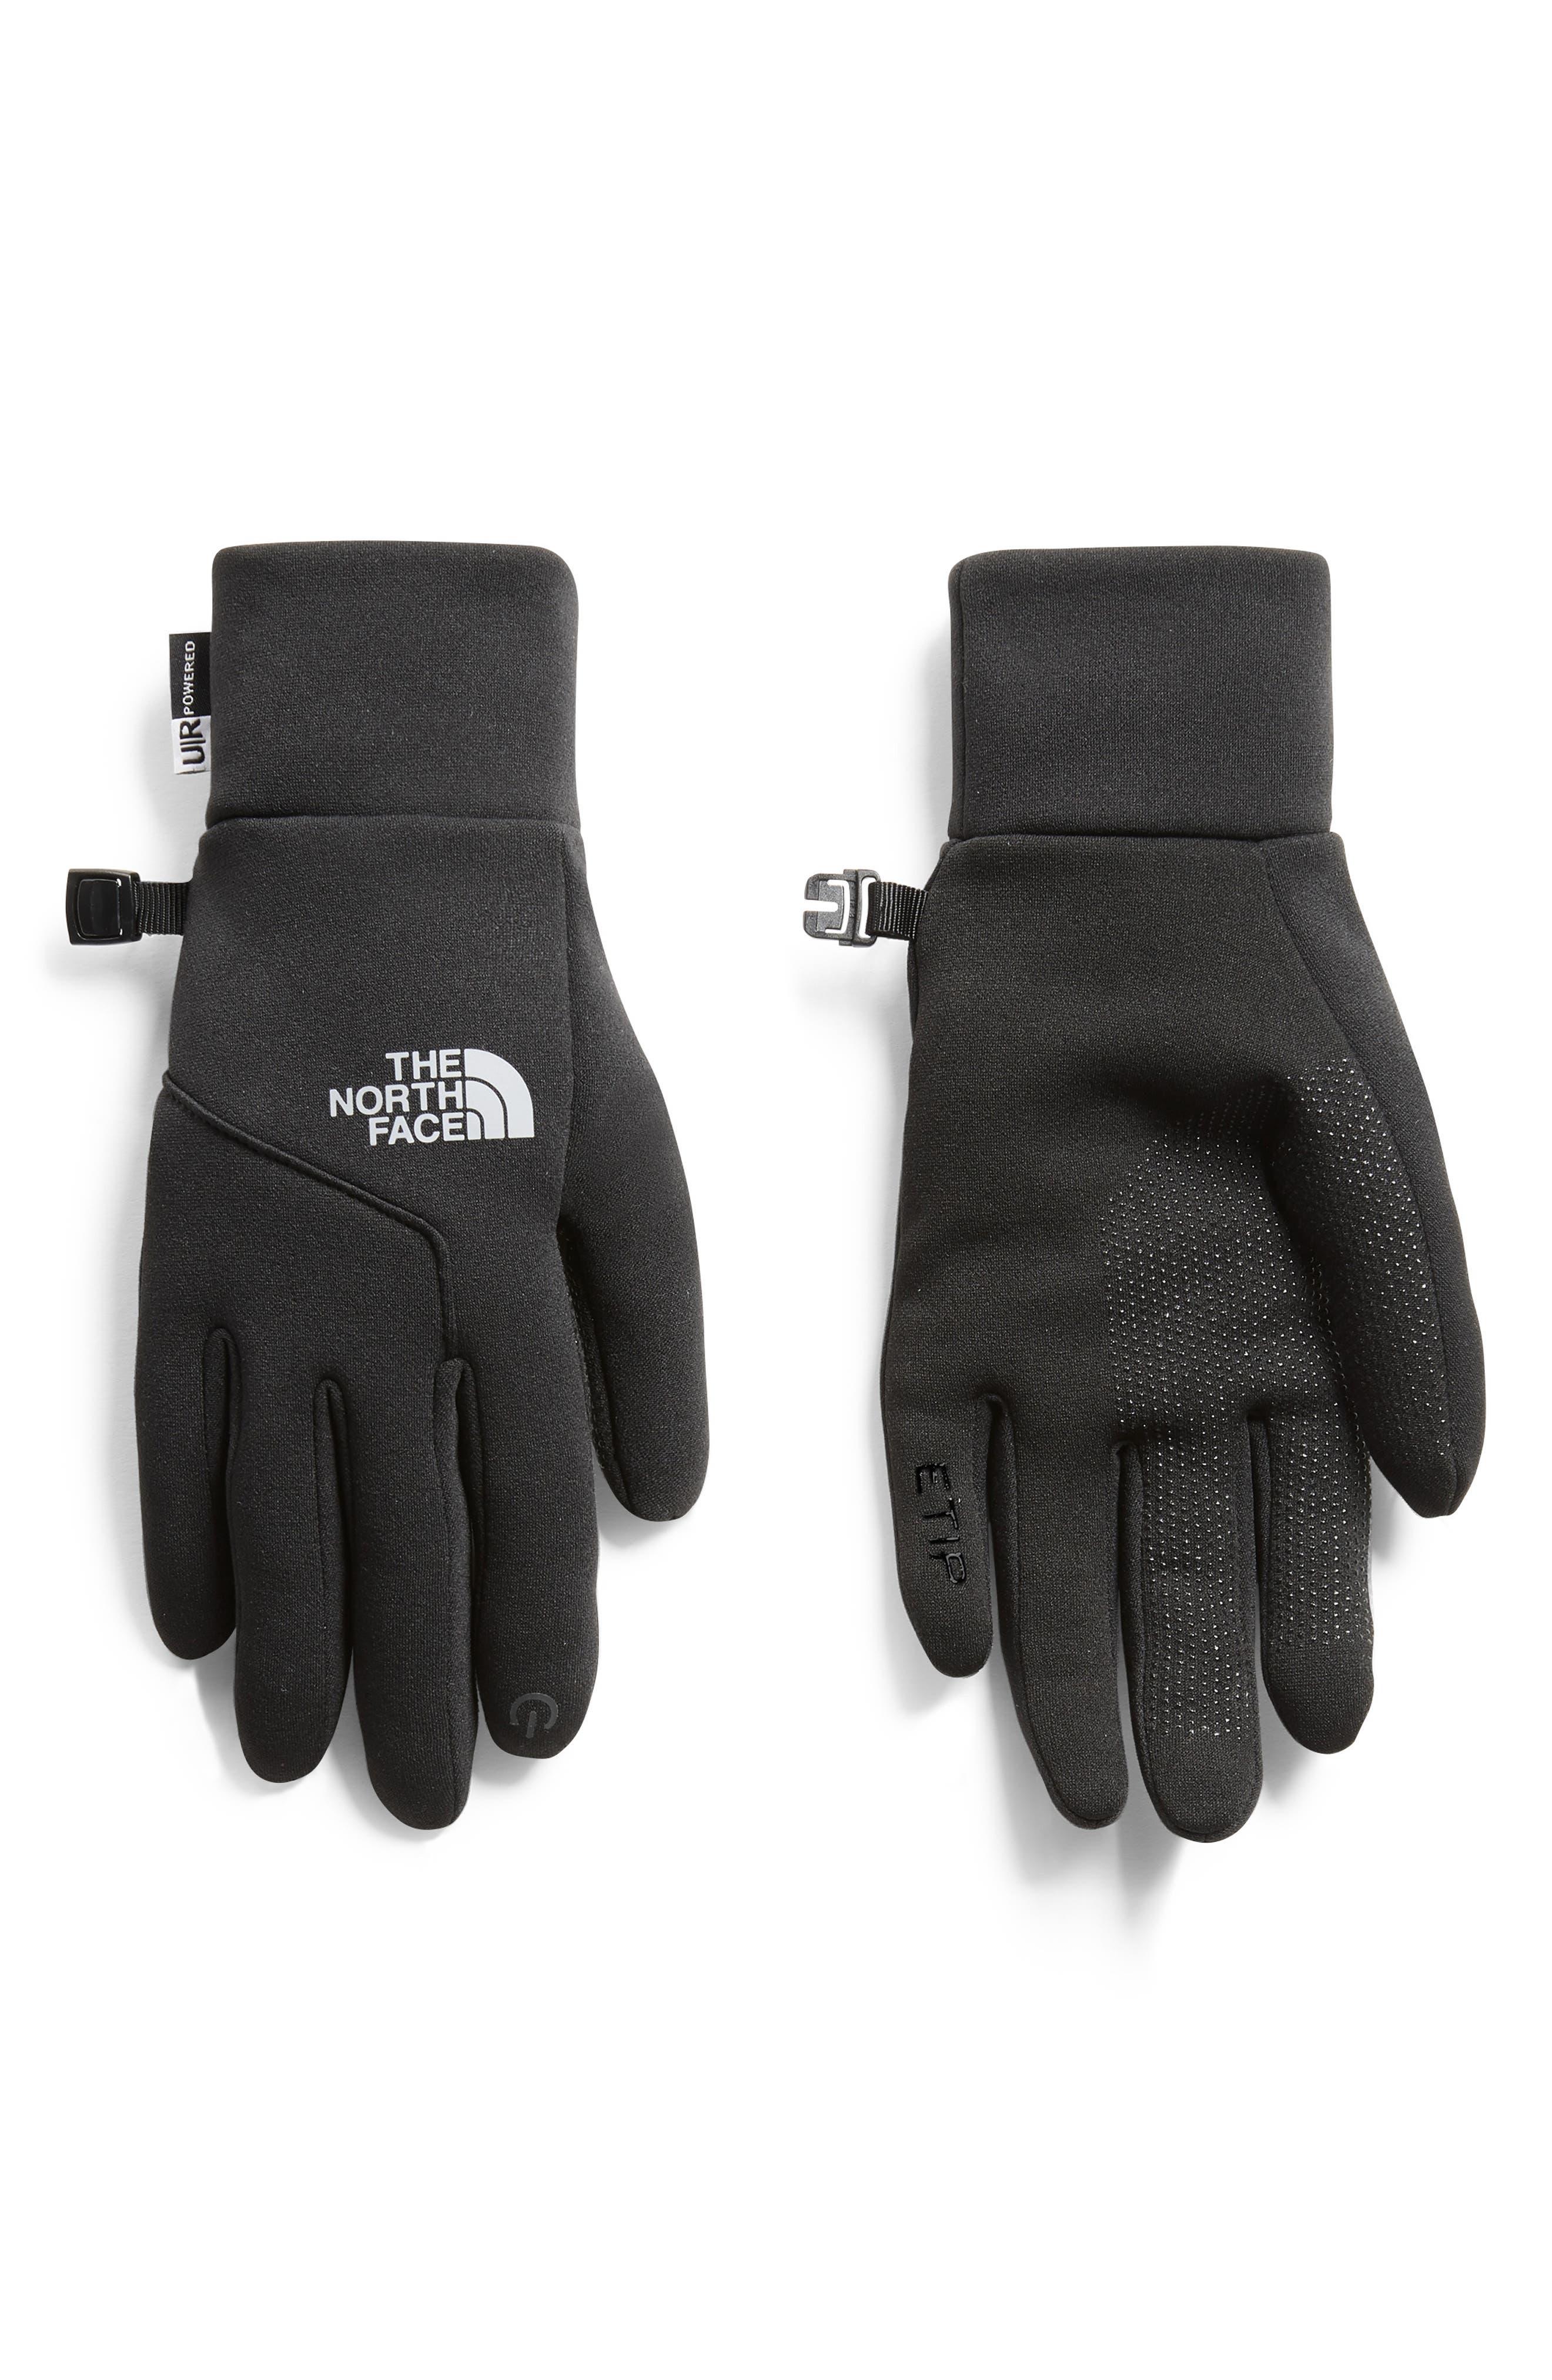 E-Tip Gloves,                             Main thumbnail 1, color,                             TNF BLACK